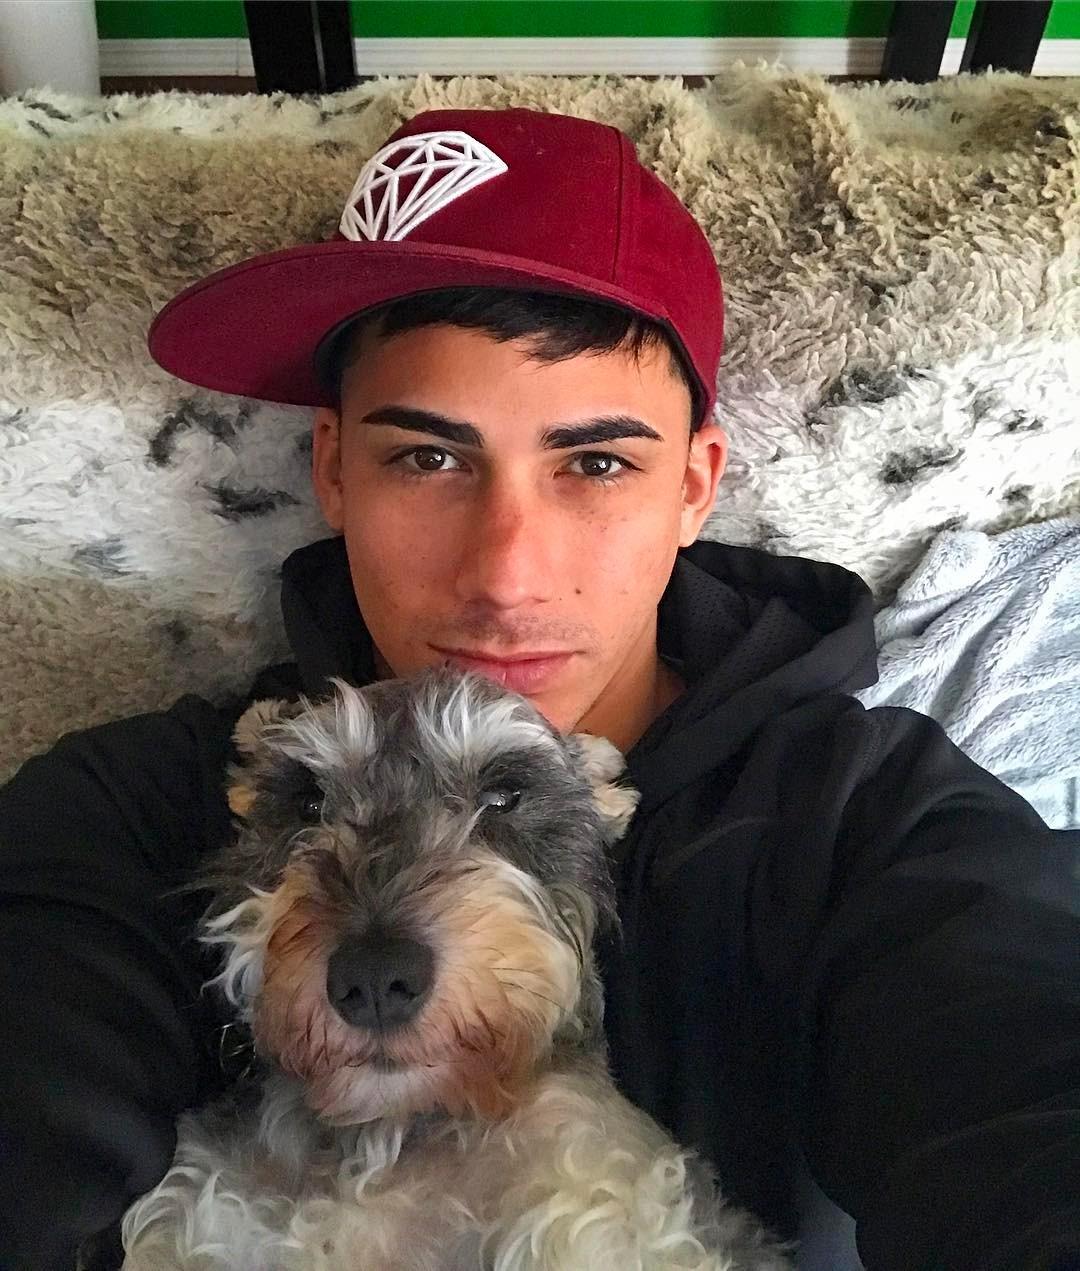 Topher Dimaggio Instagram username